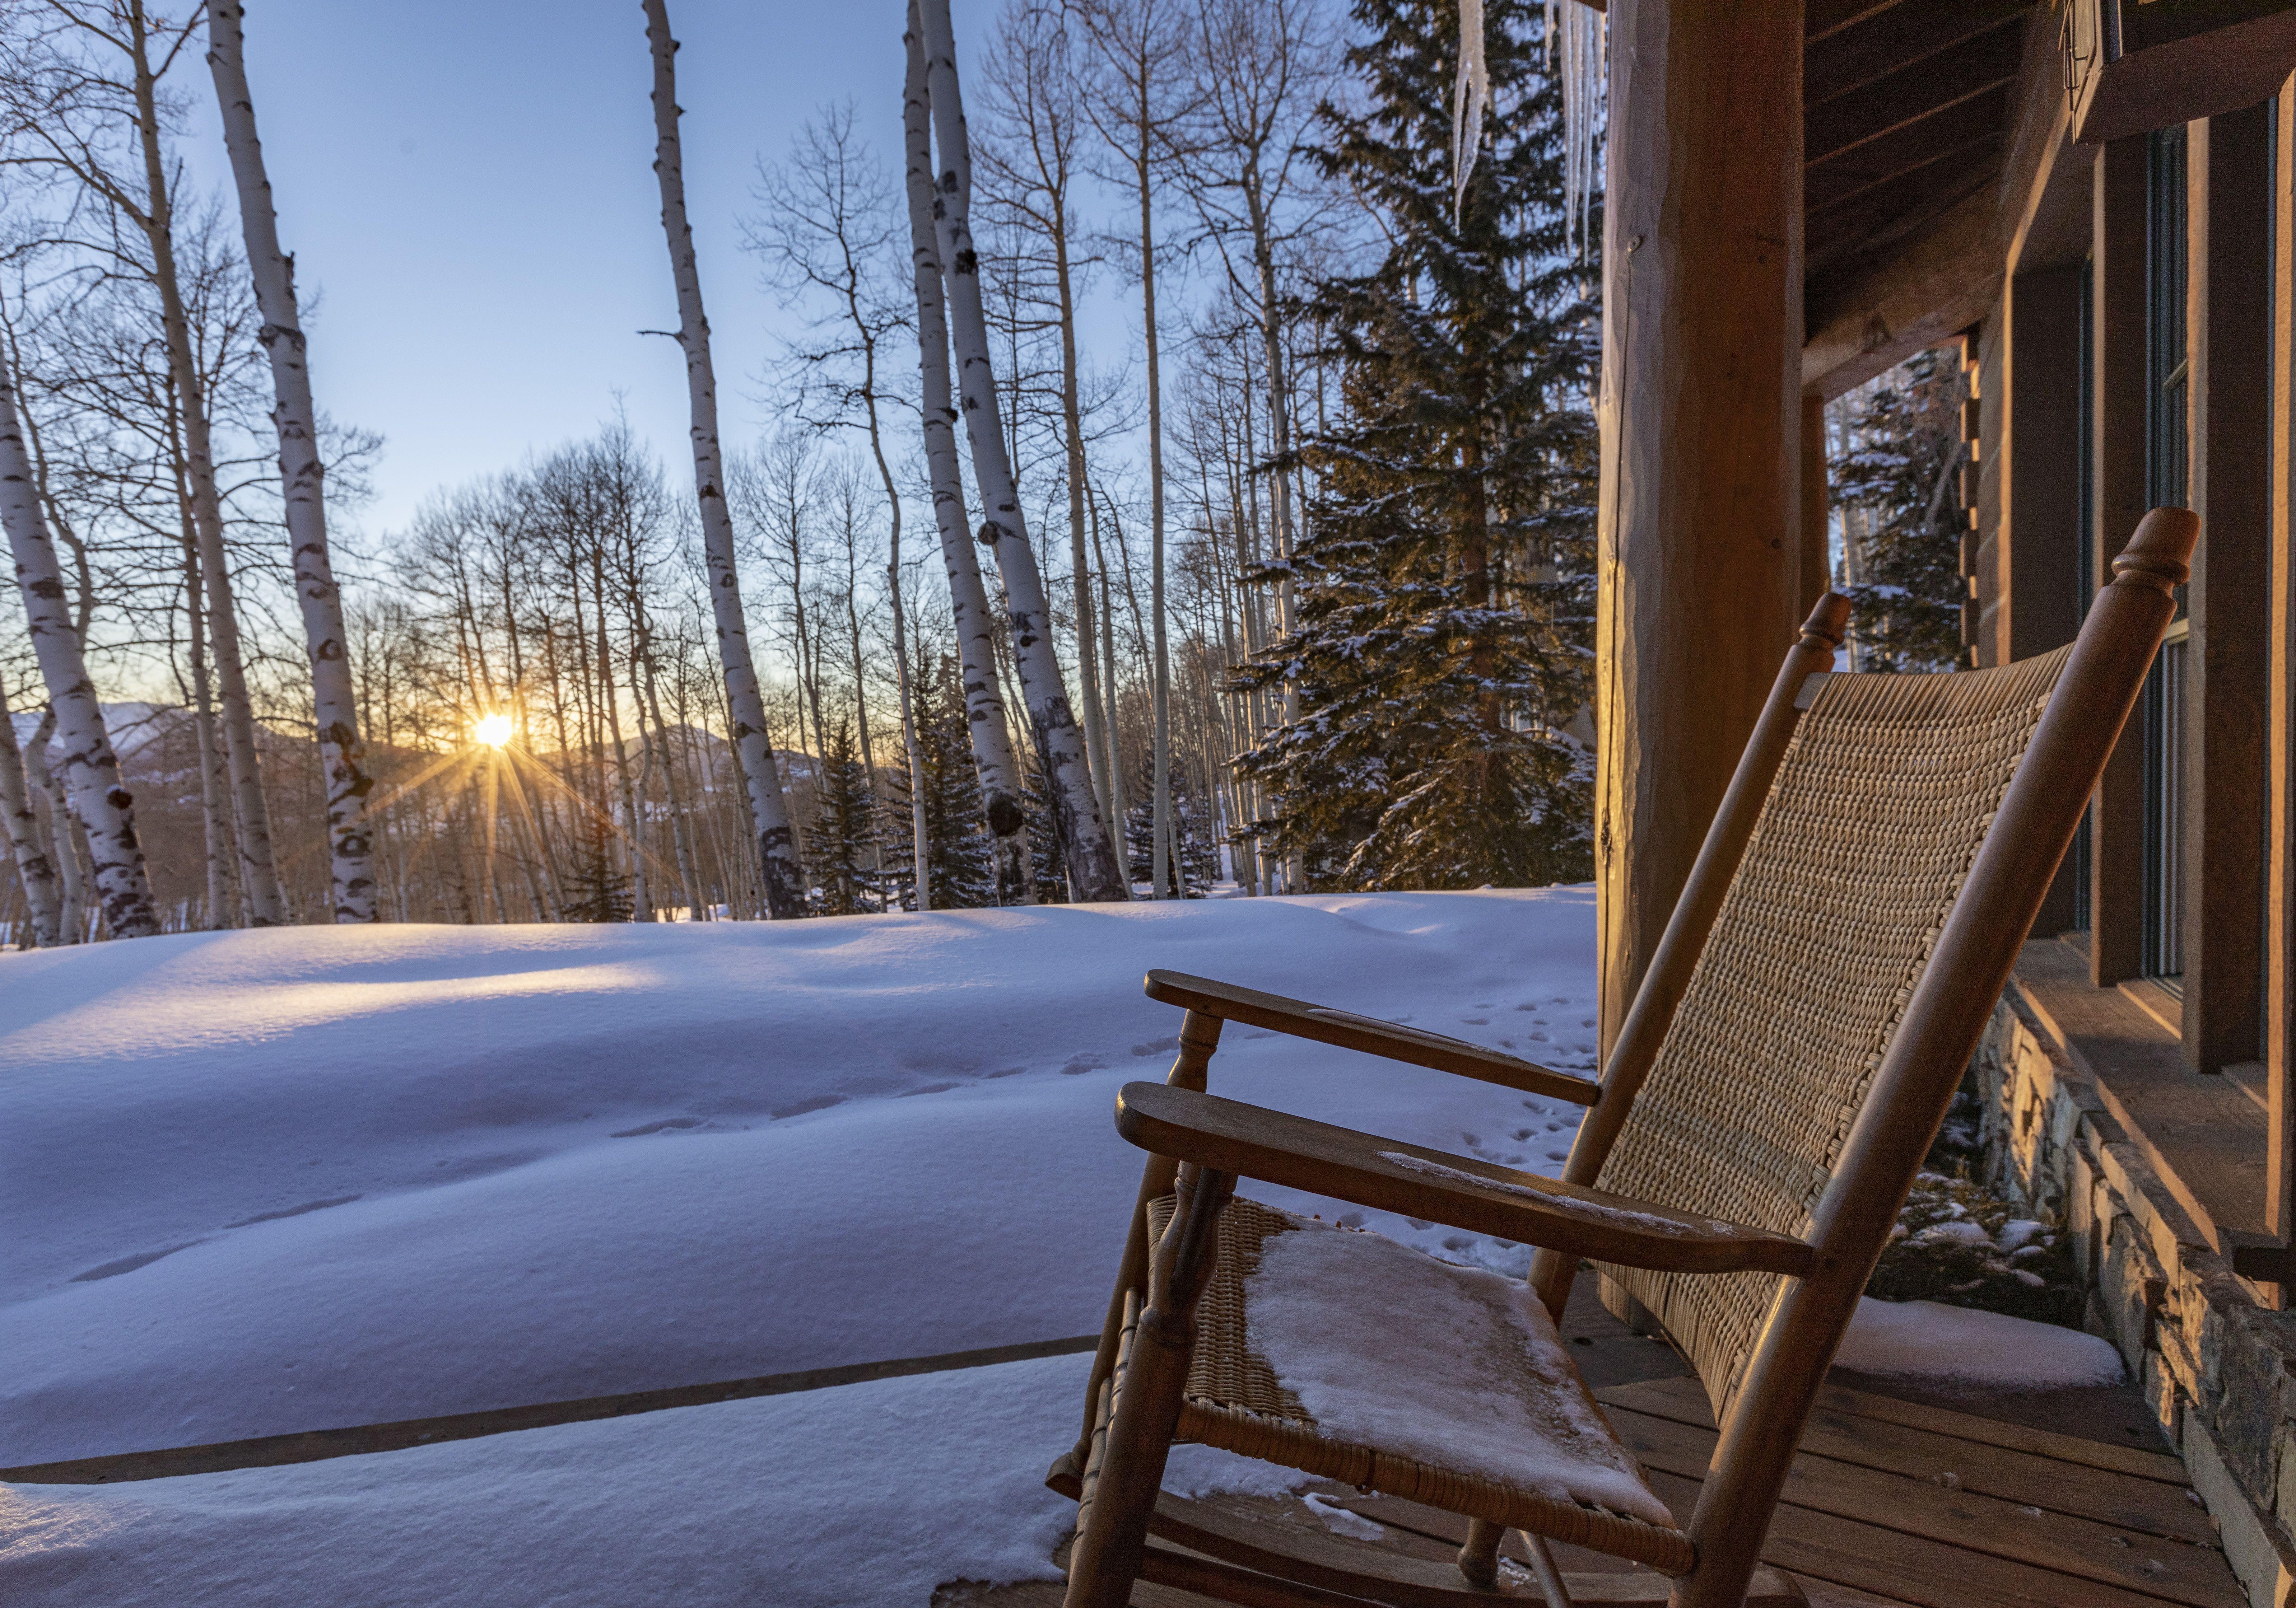 Tom Cruise's Telluride Ranch rocking chair